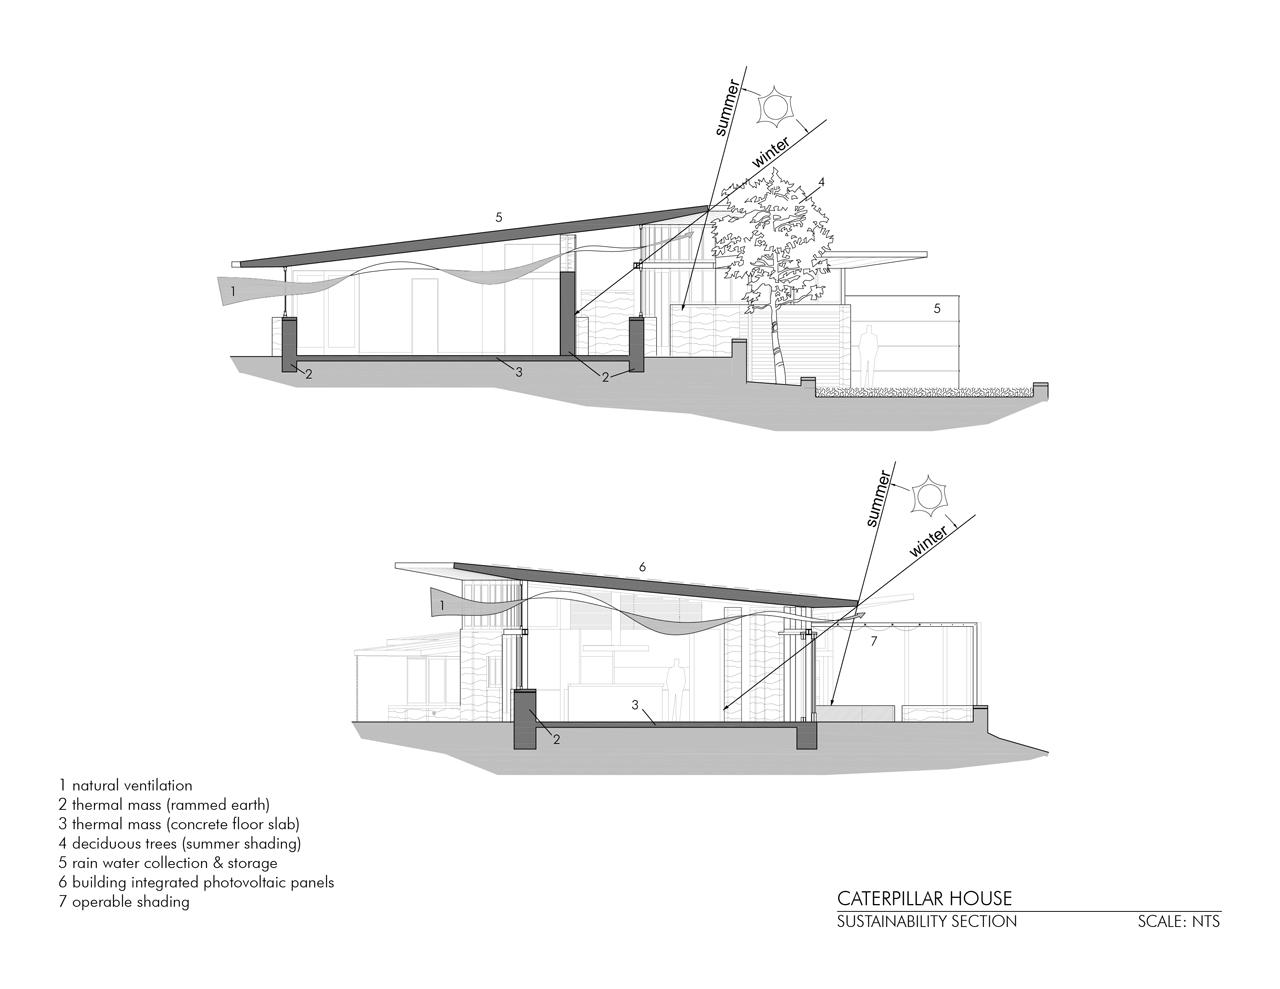 Sustainability Section, Caterpillar House in Carmel, California by Feldman Architecture